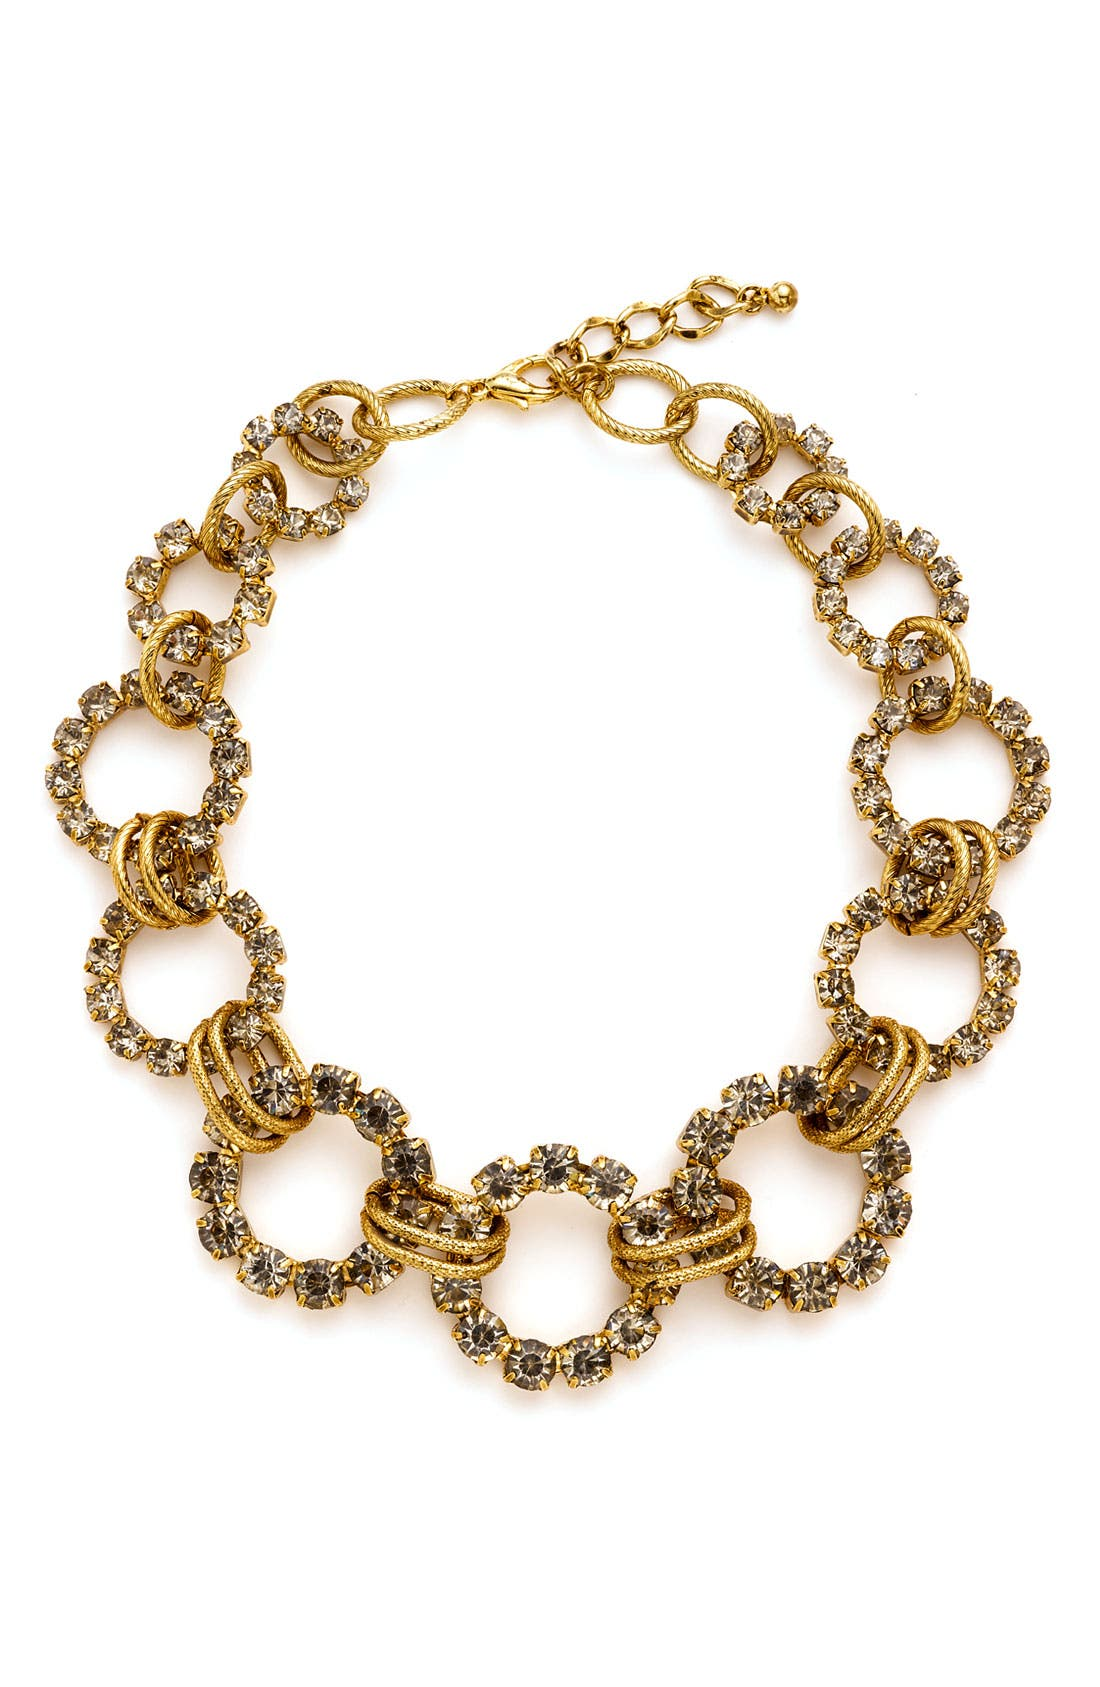 Main Image - Tasha Pavé Open Circle Necklace